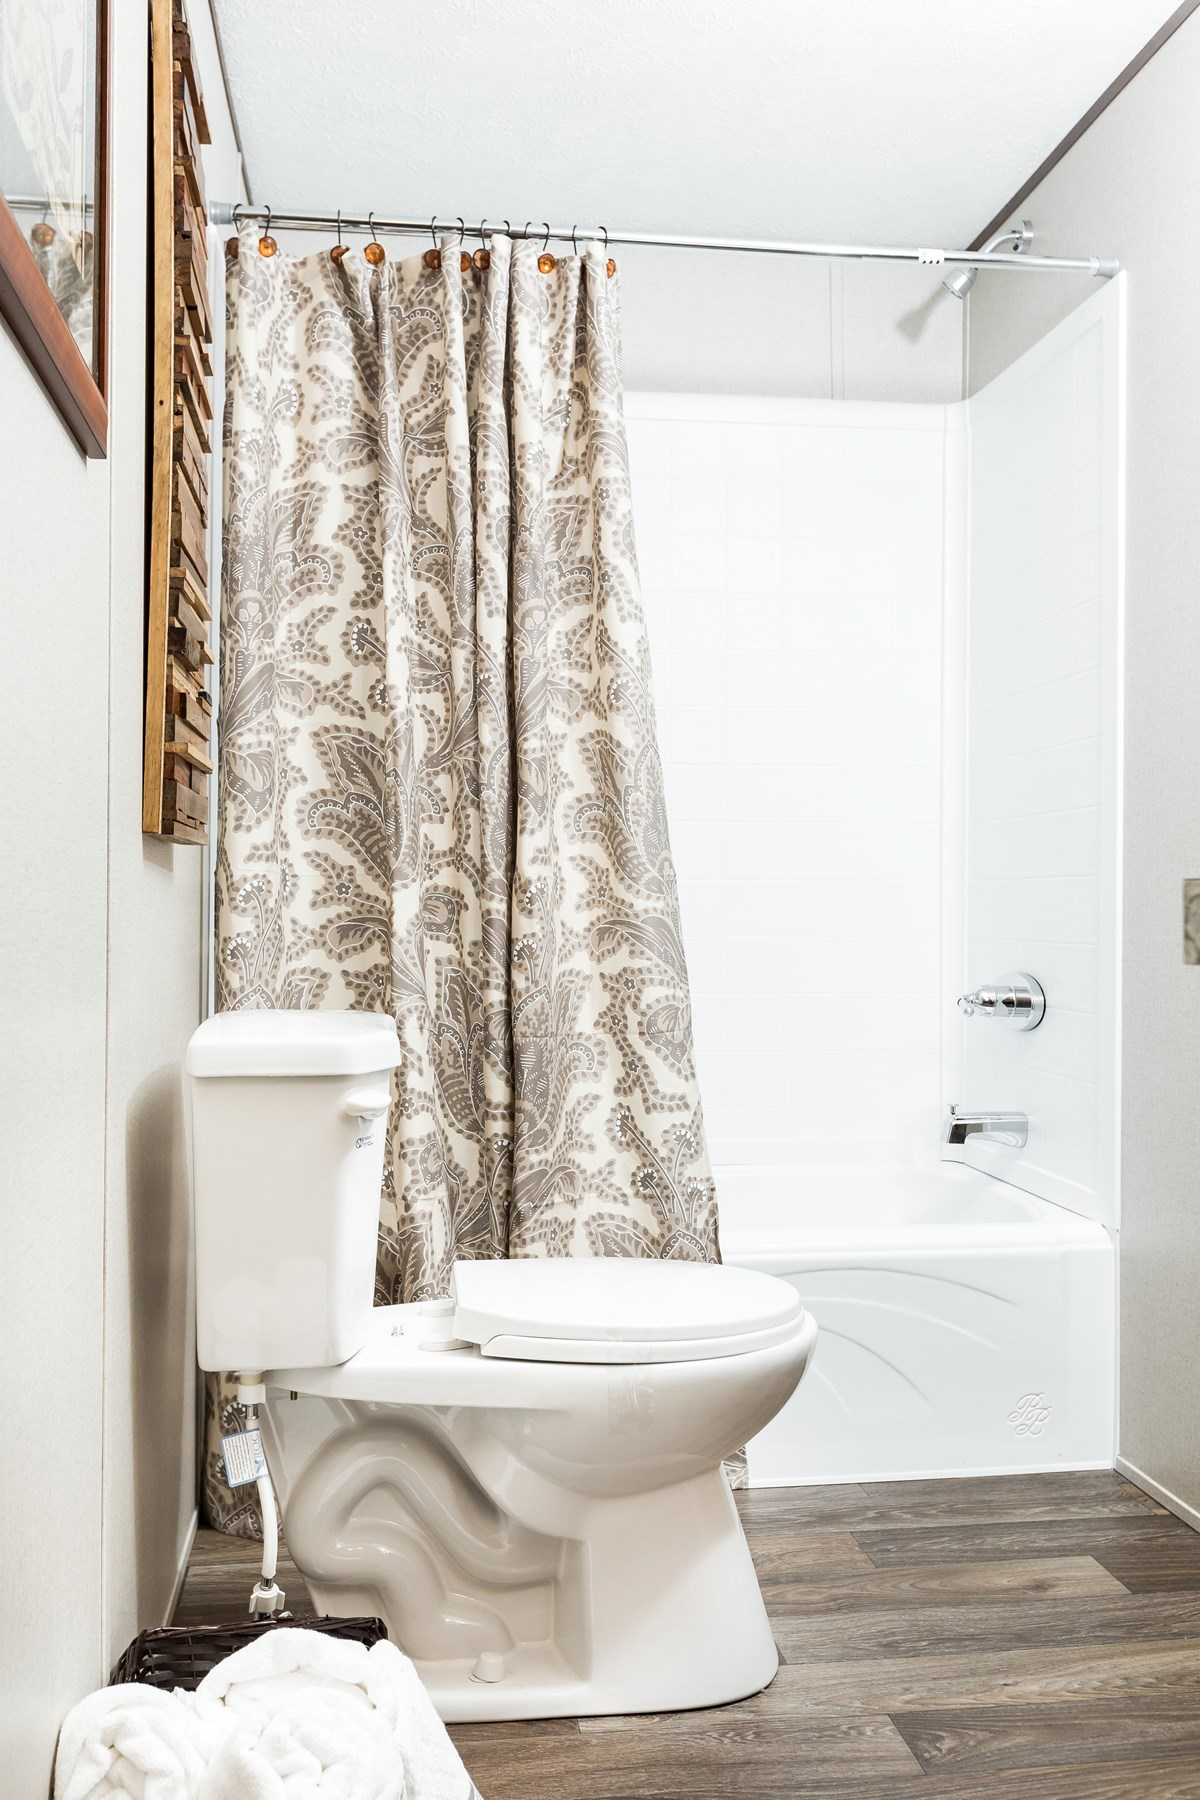 Manufactured-EXHILARATION-36TRU14763AH-Master-Bathroom-20180516-0909537991796.jpg